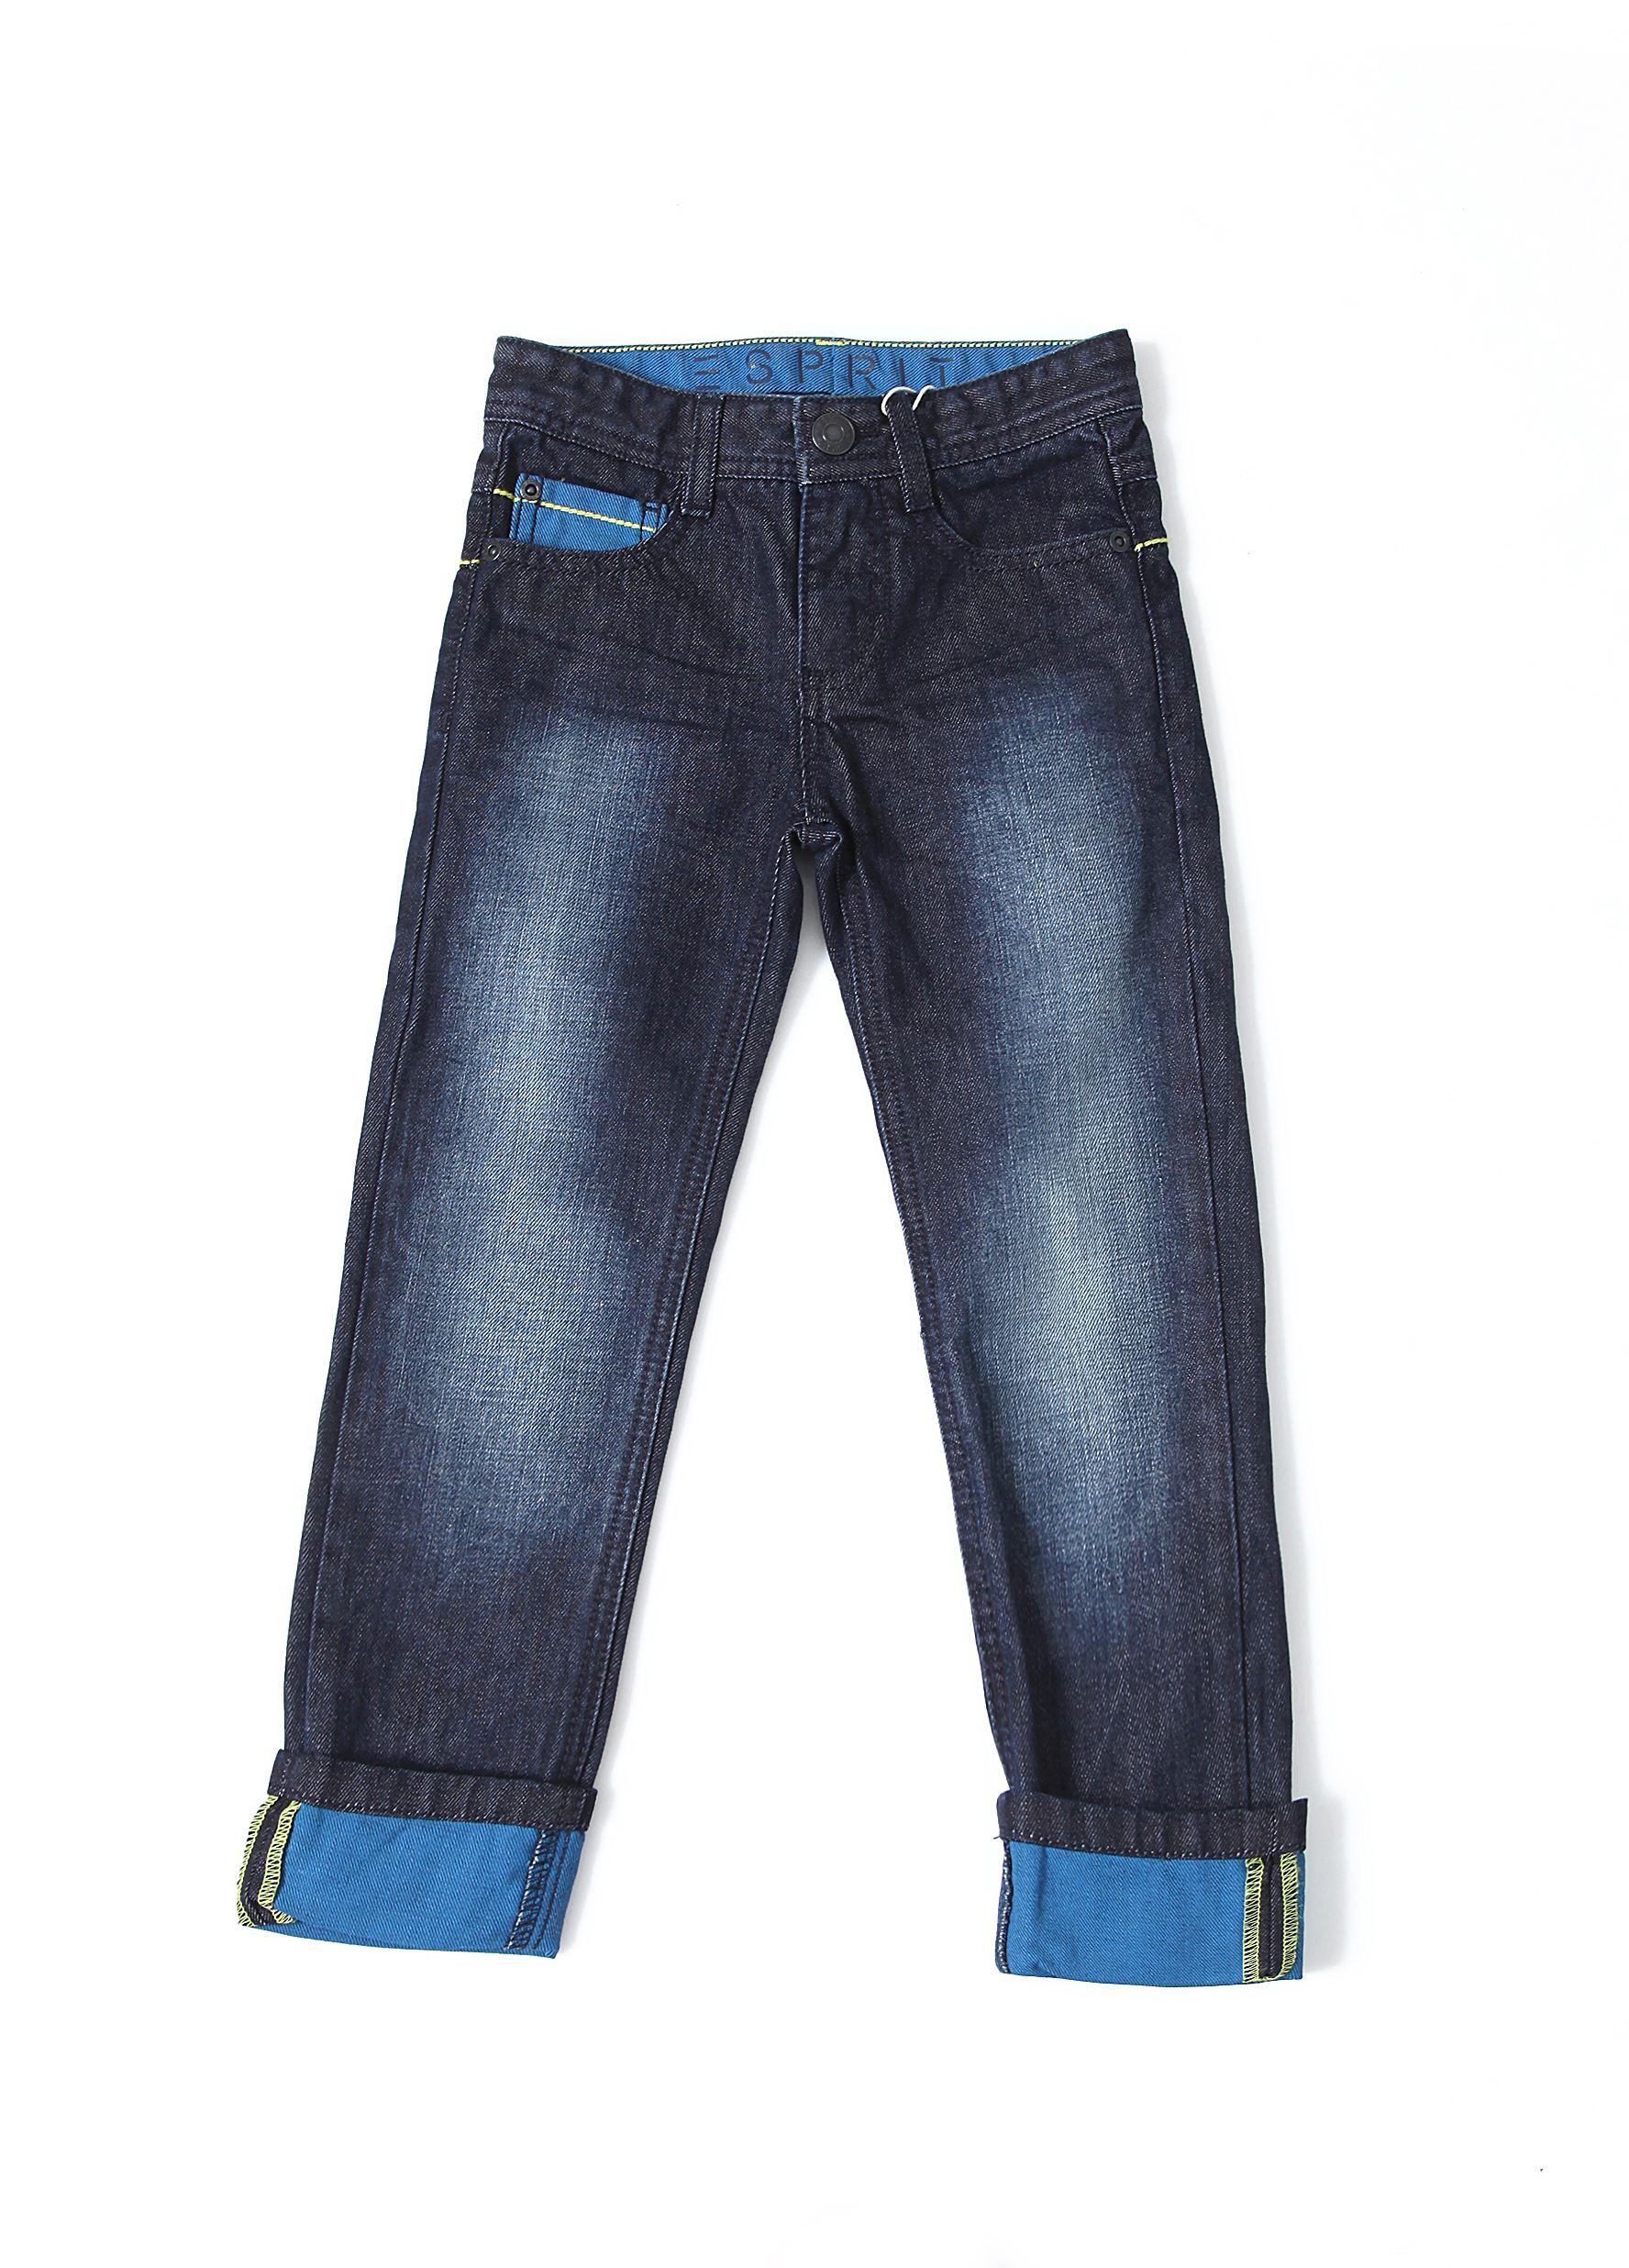 Esprit Kids - Παιδικό Παντελόνι ESPRIT